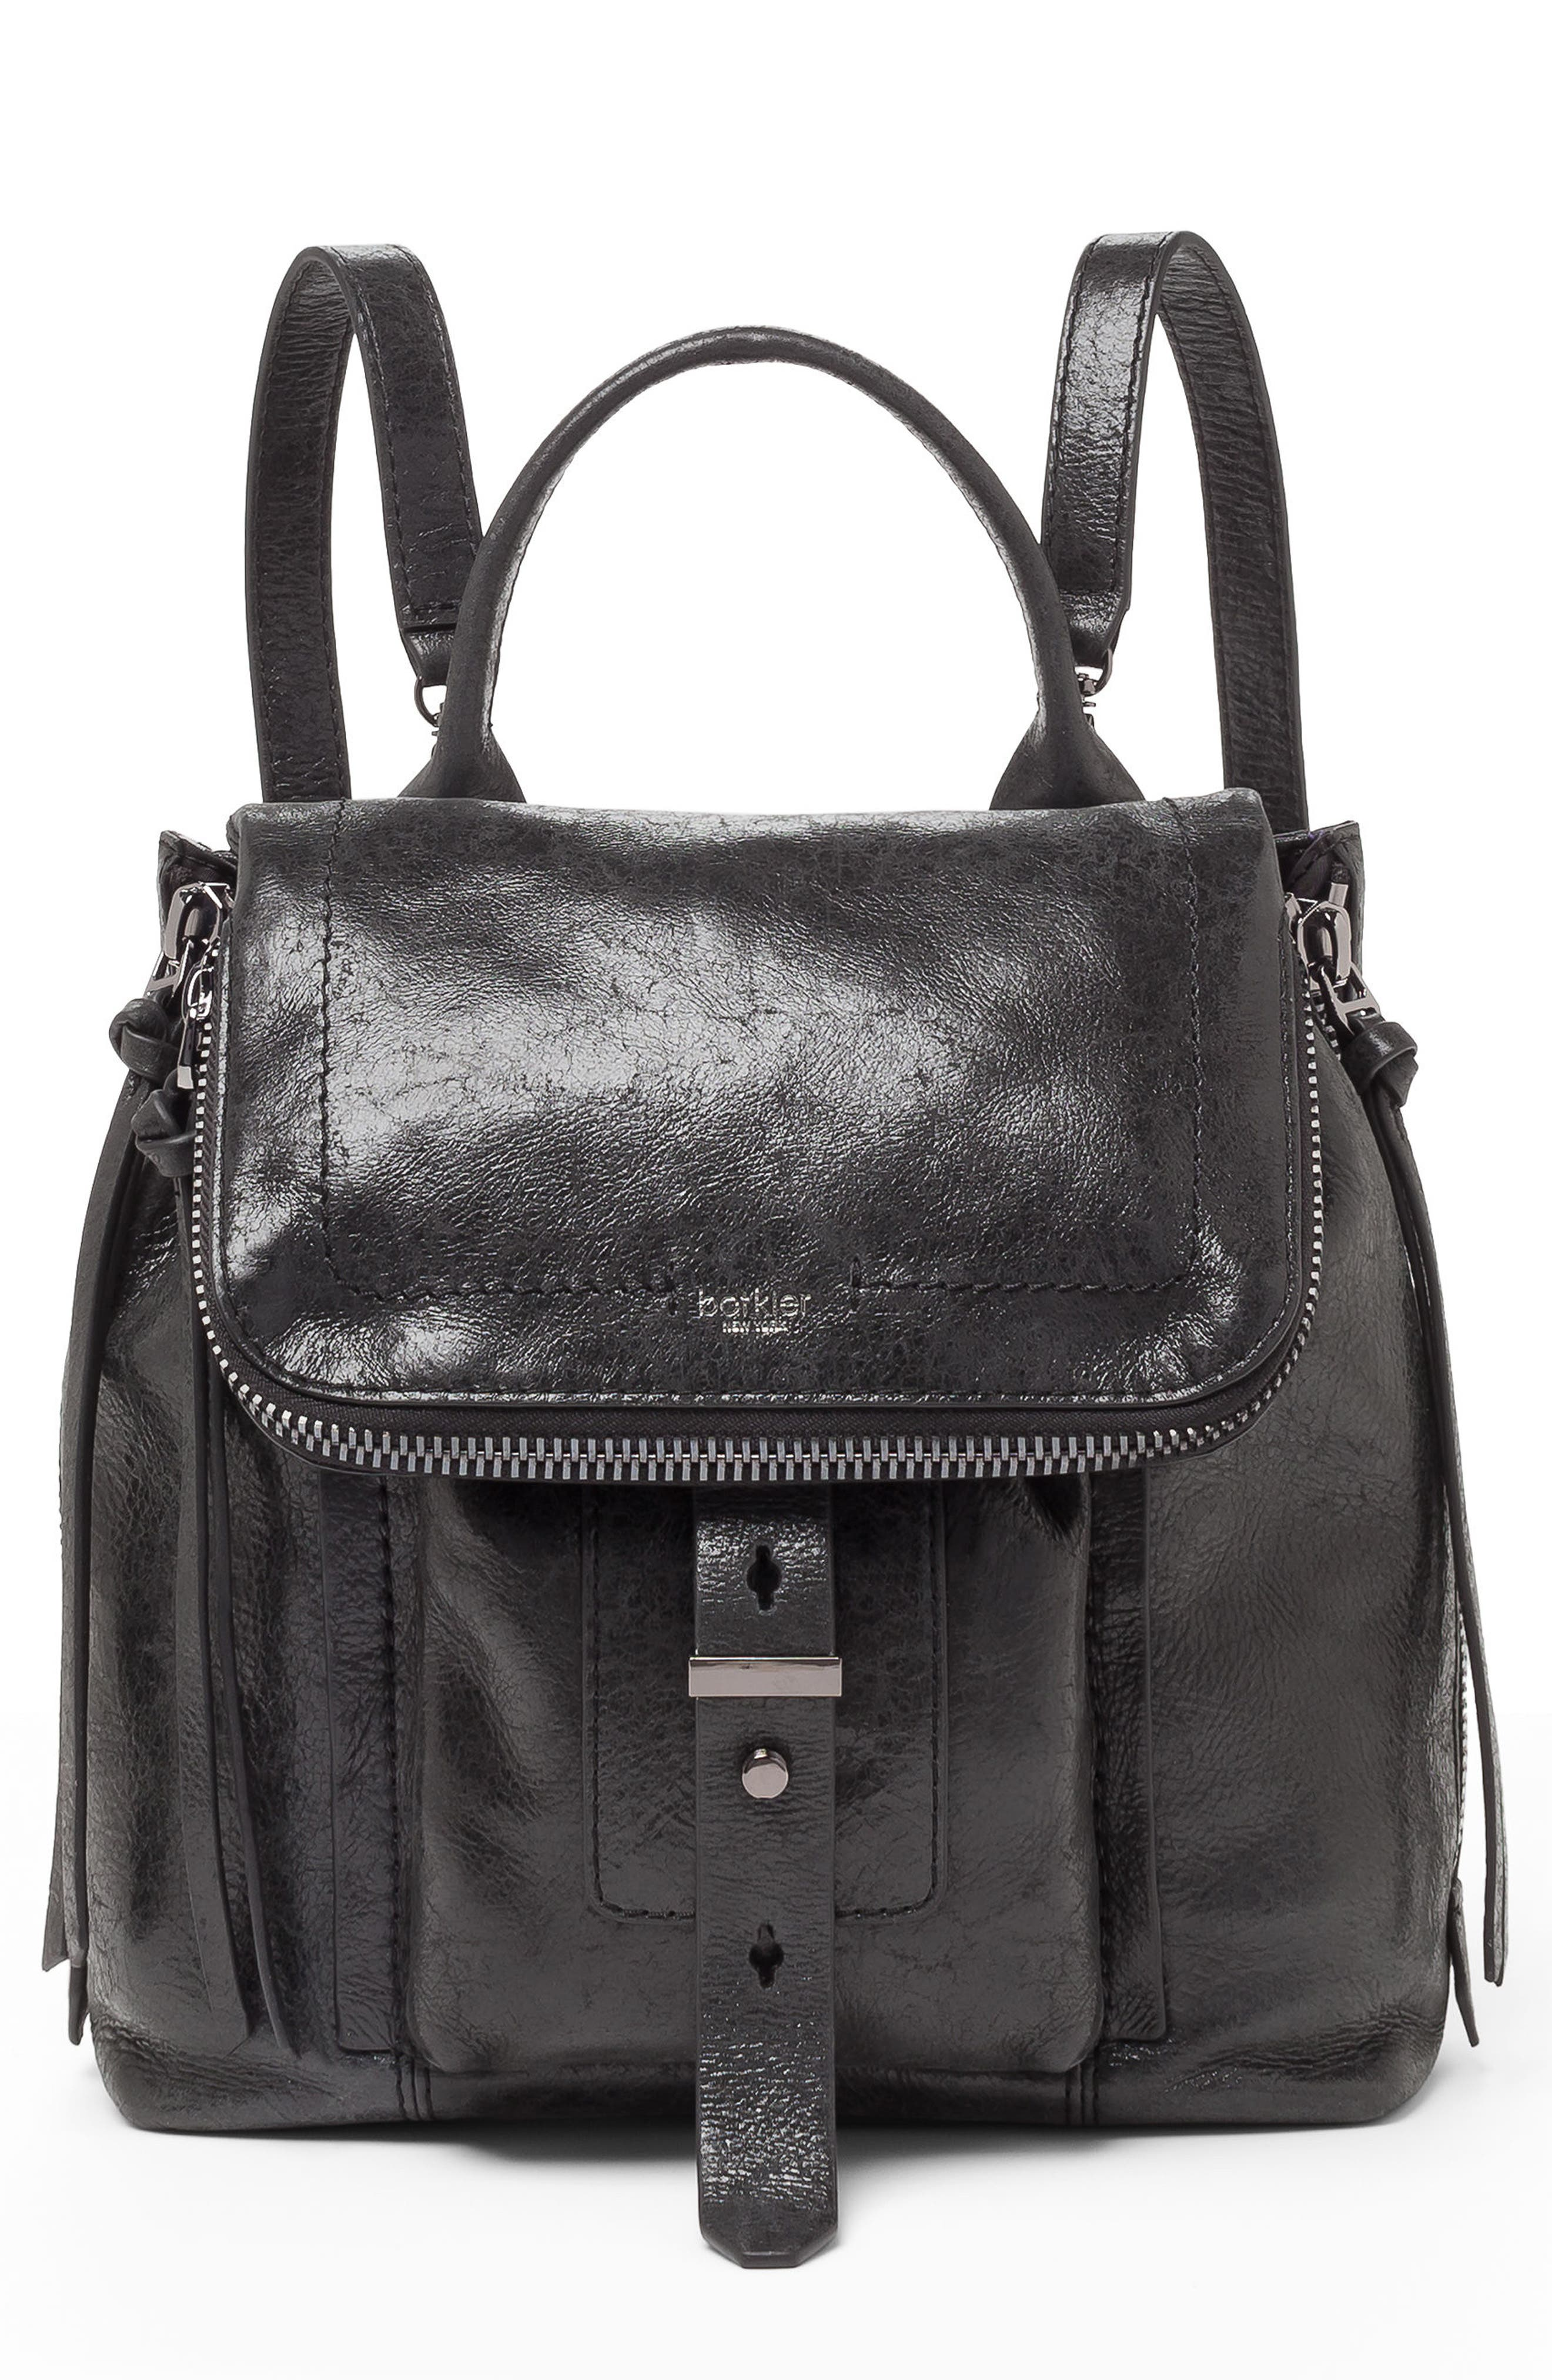 Alternate Image 1 Selected - Botkier Warren Leather Backpack